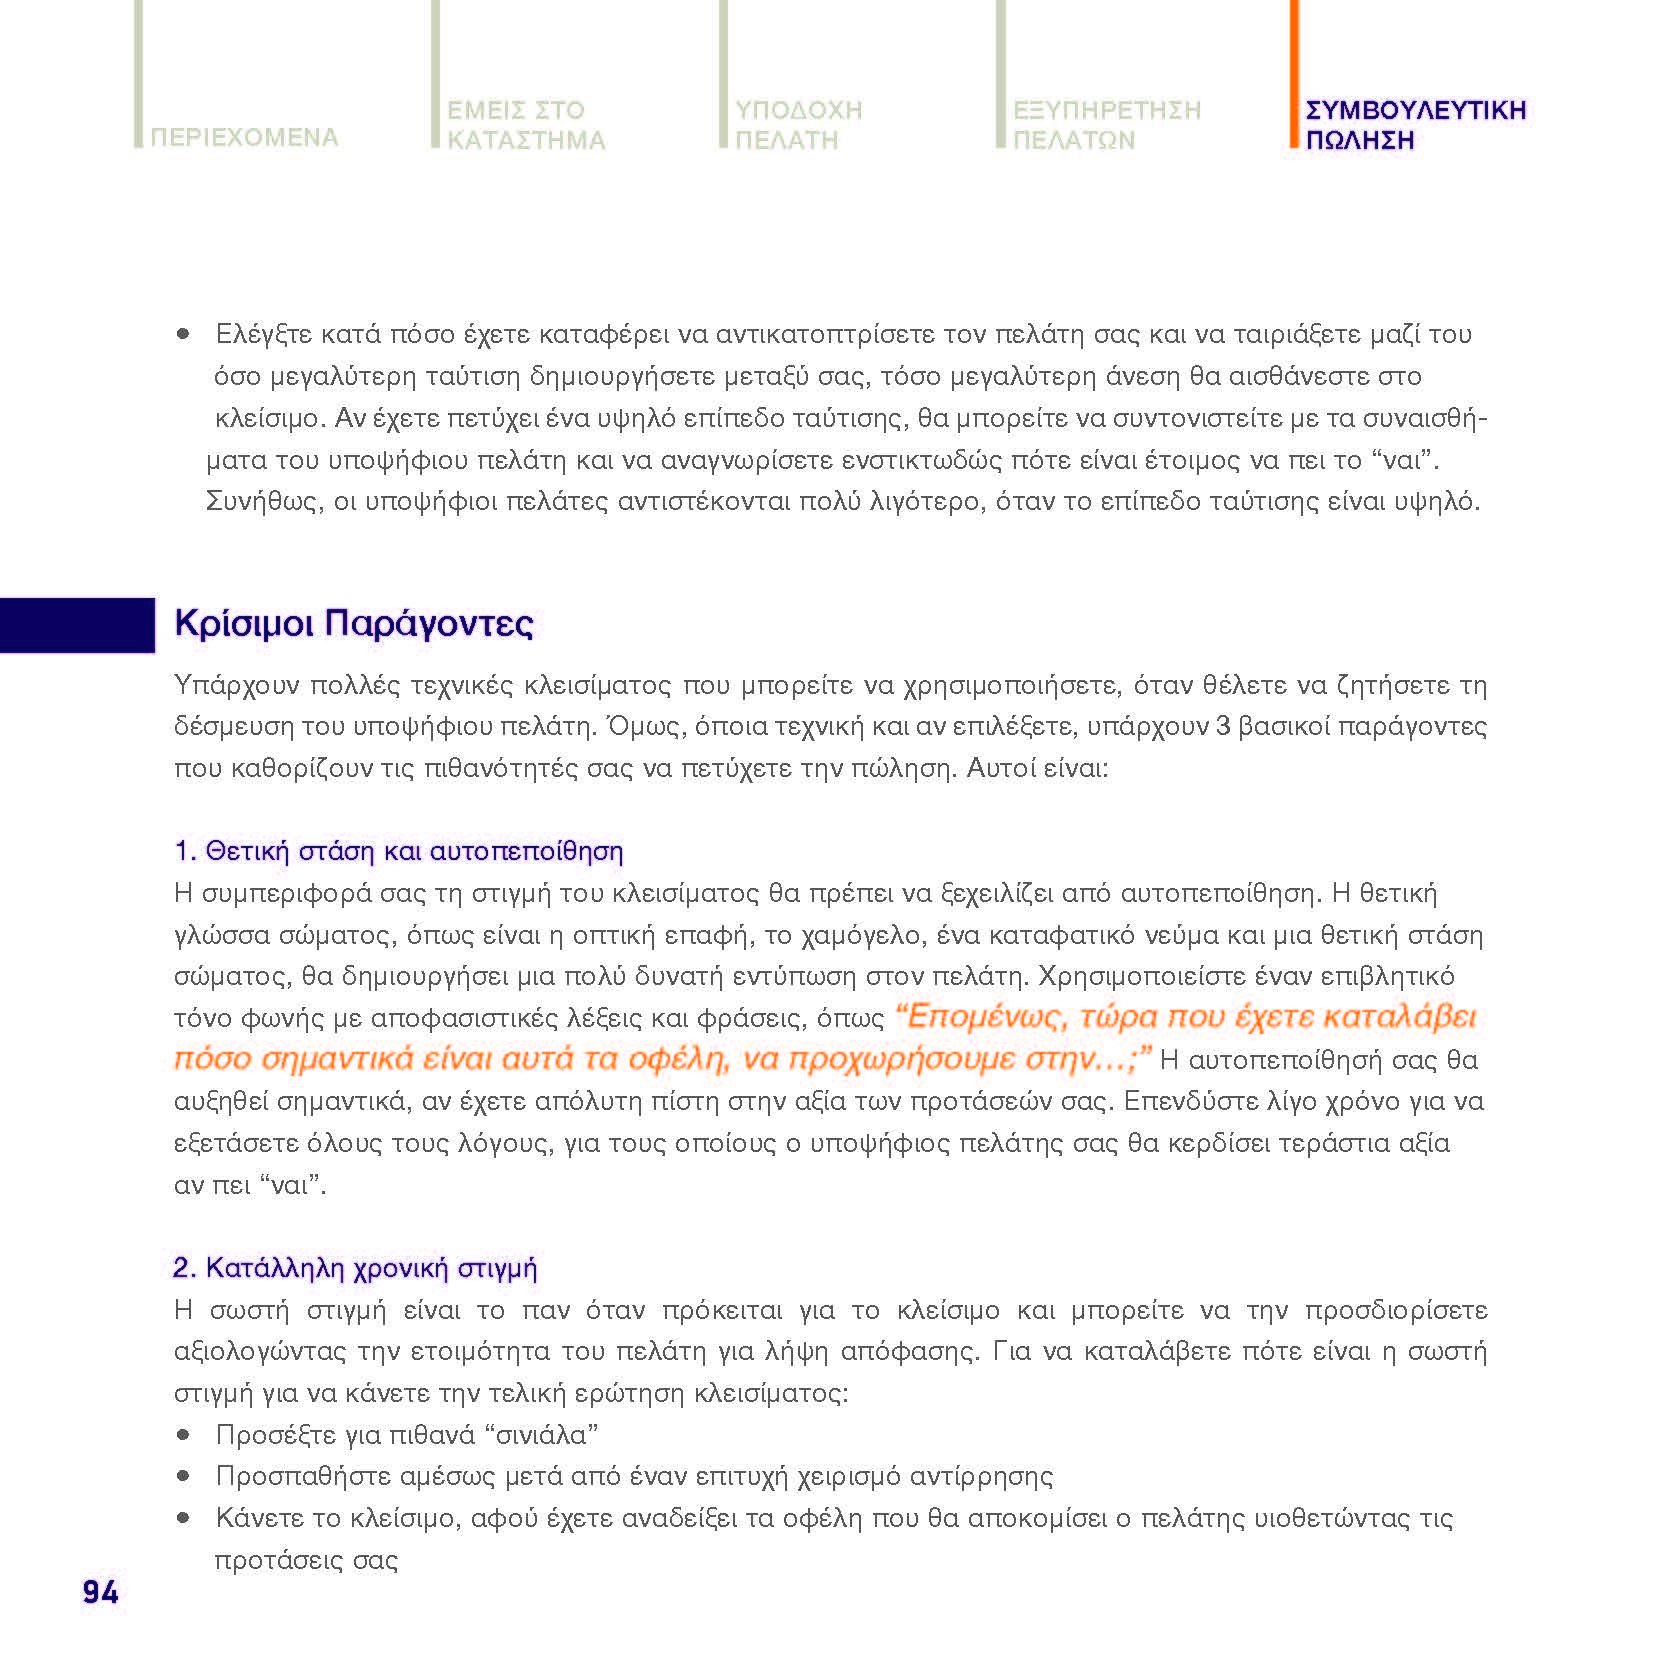 https://www.jib.gr/wp-content/uploads/2020/09/OPTIMA-BANK-BOOKLET-WEB_Page_094.jpg